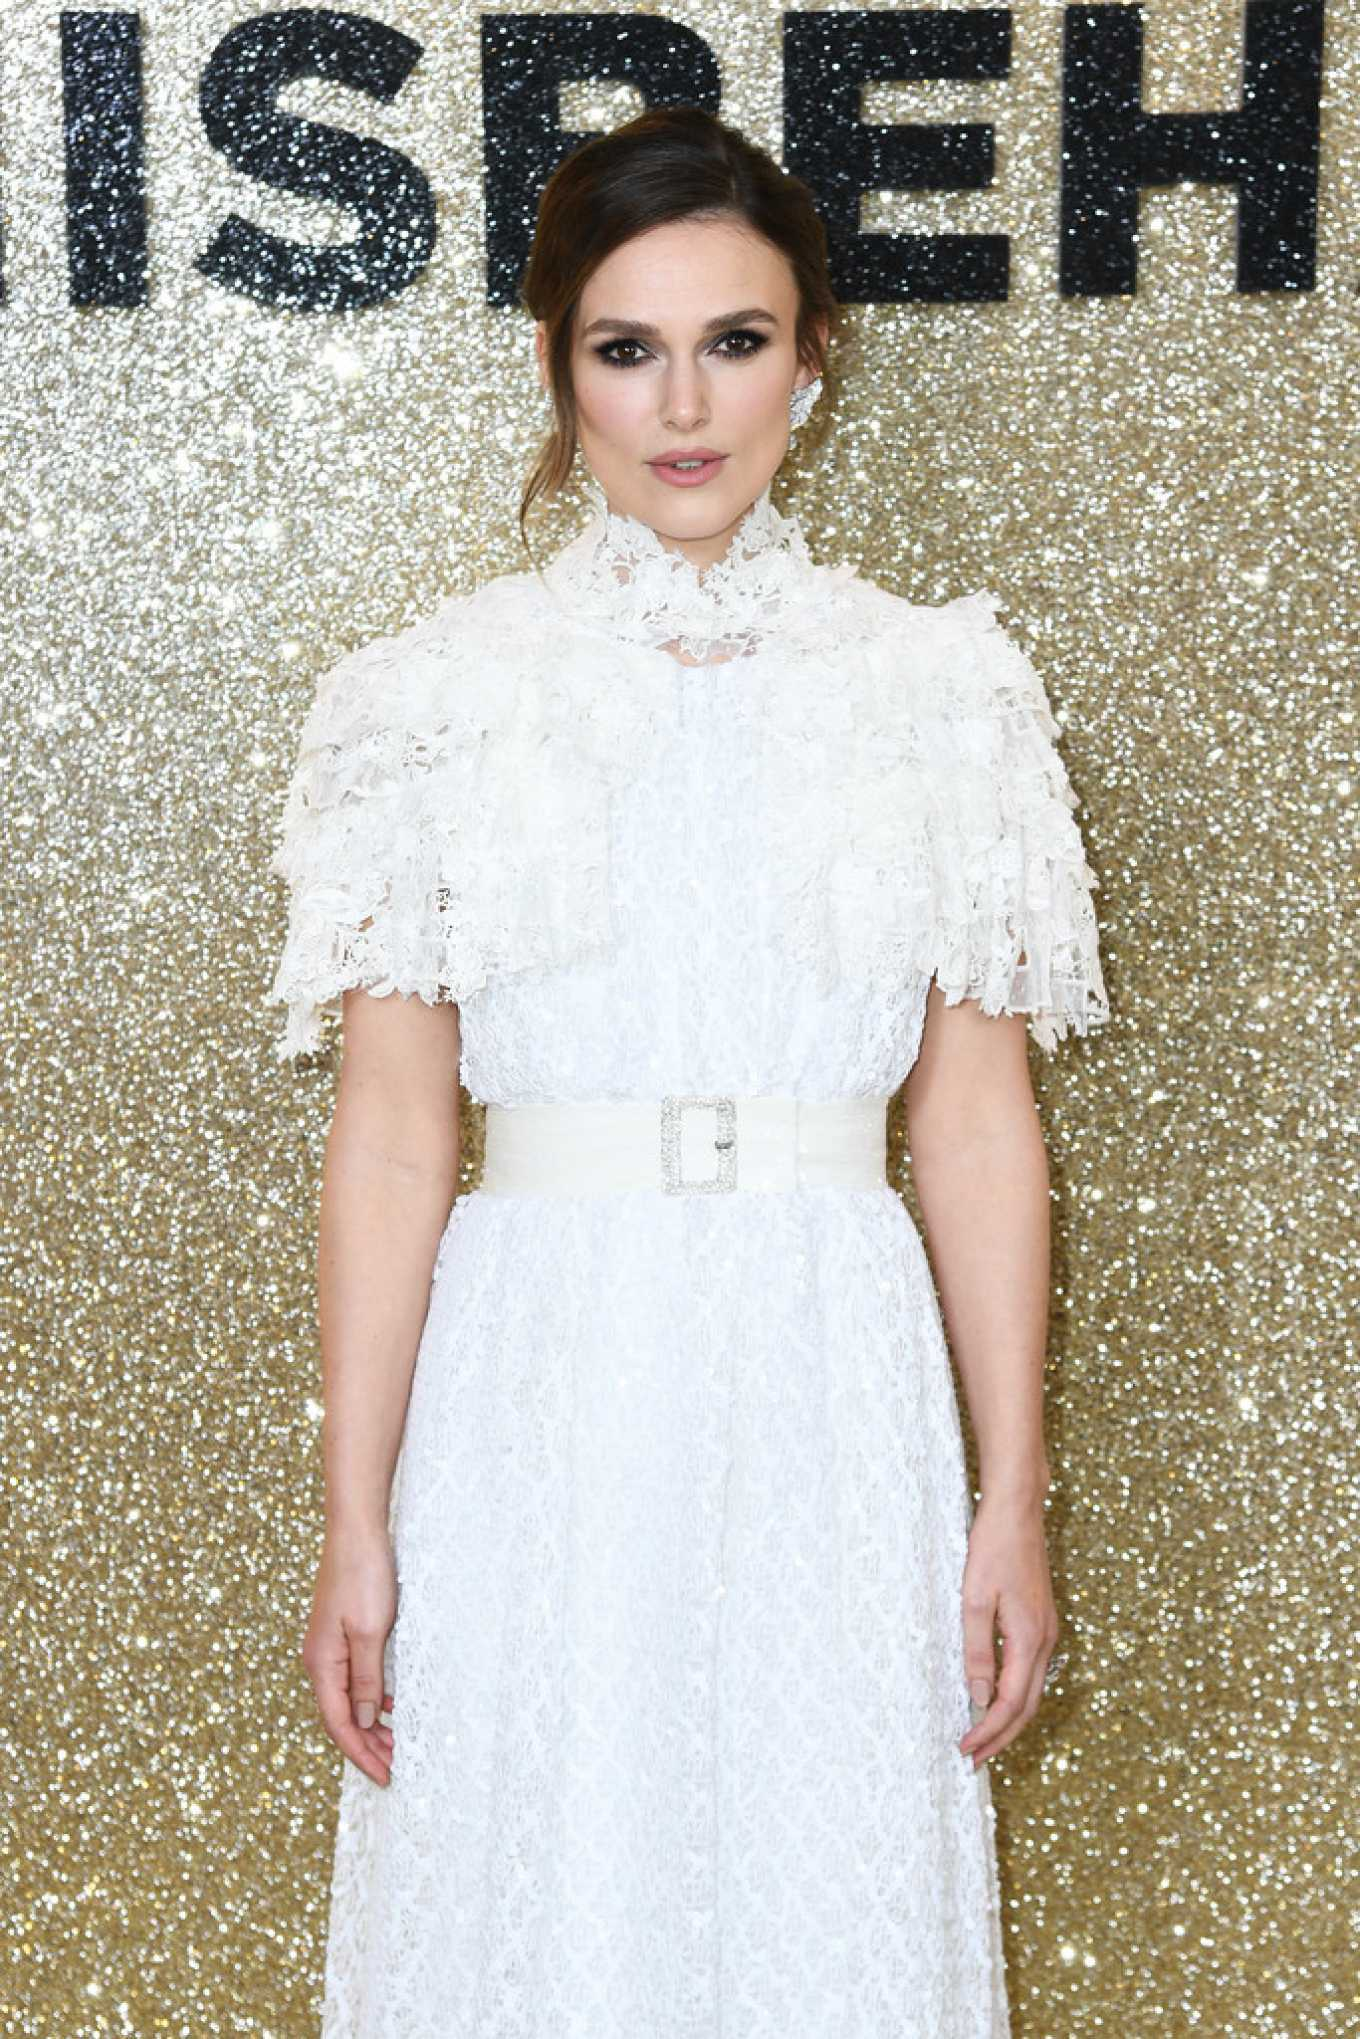 Keira Knightley 2020 : Keira Knightley – Misbehaviour Premiere in London-03